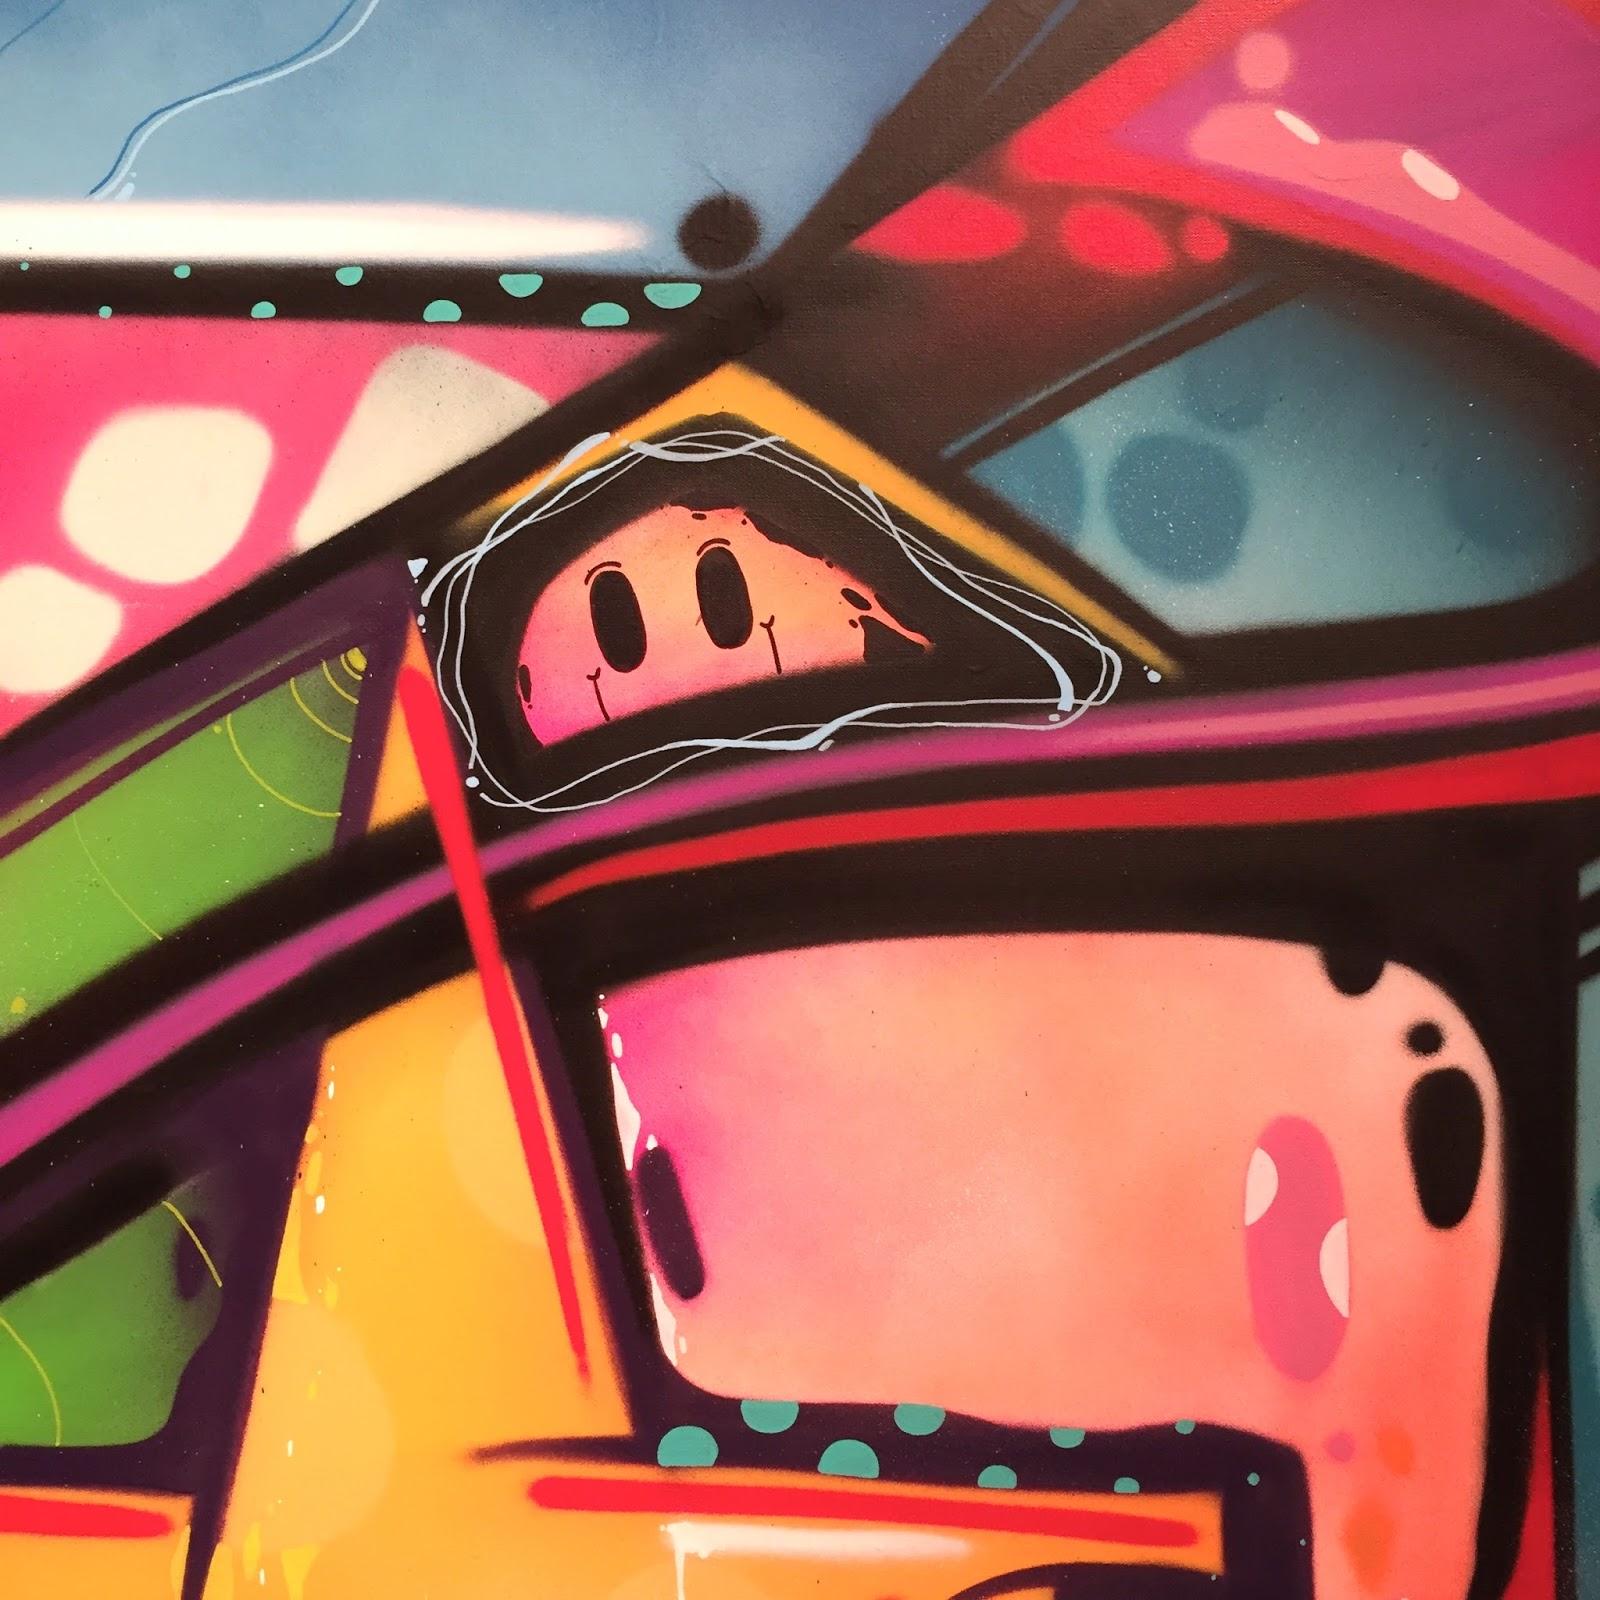 Art Amp Fashion Salon Quot No Days Off Quot For Graffiti Artist Hoacs